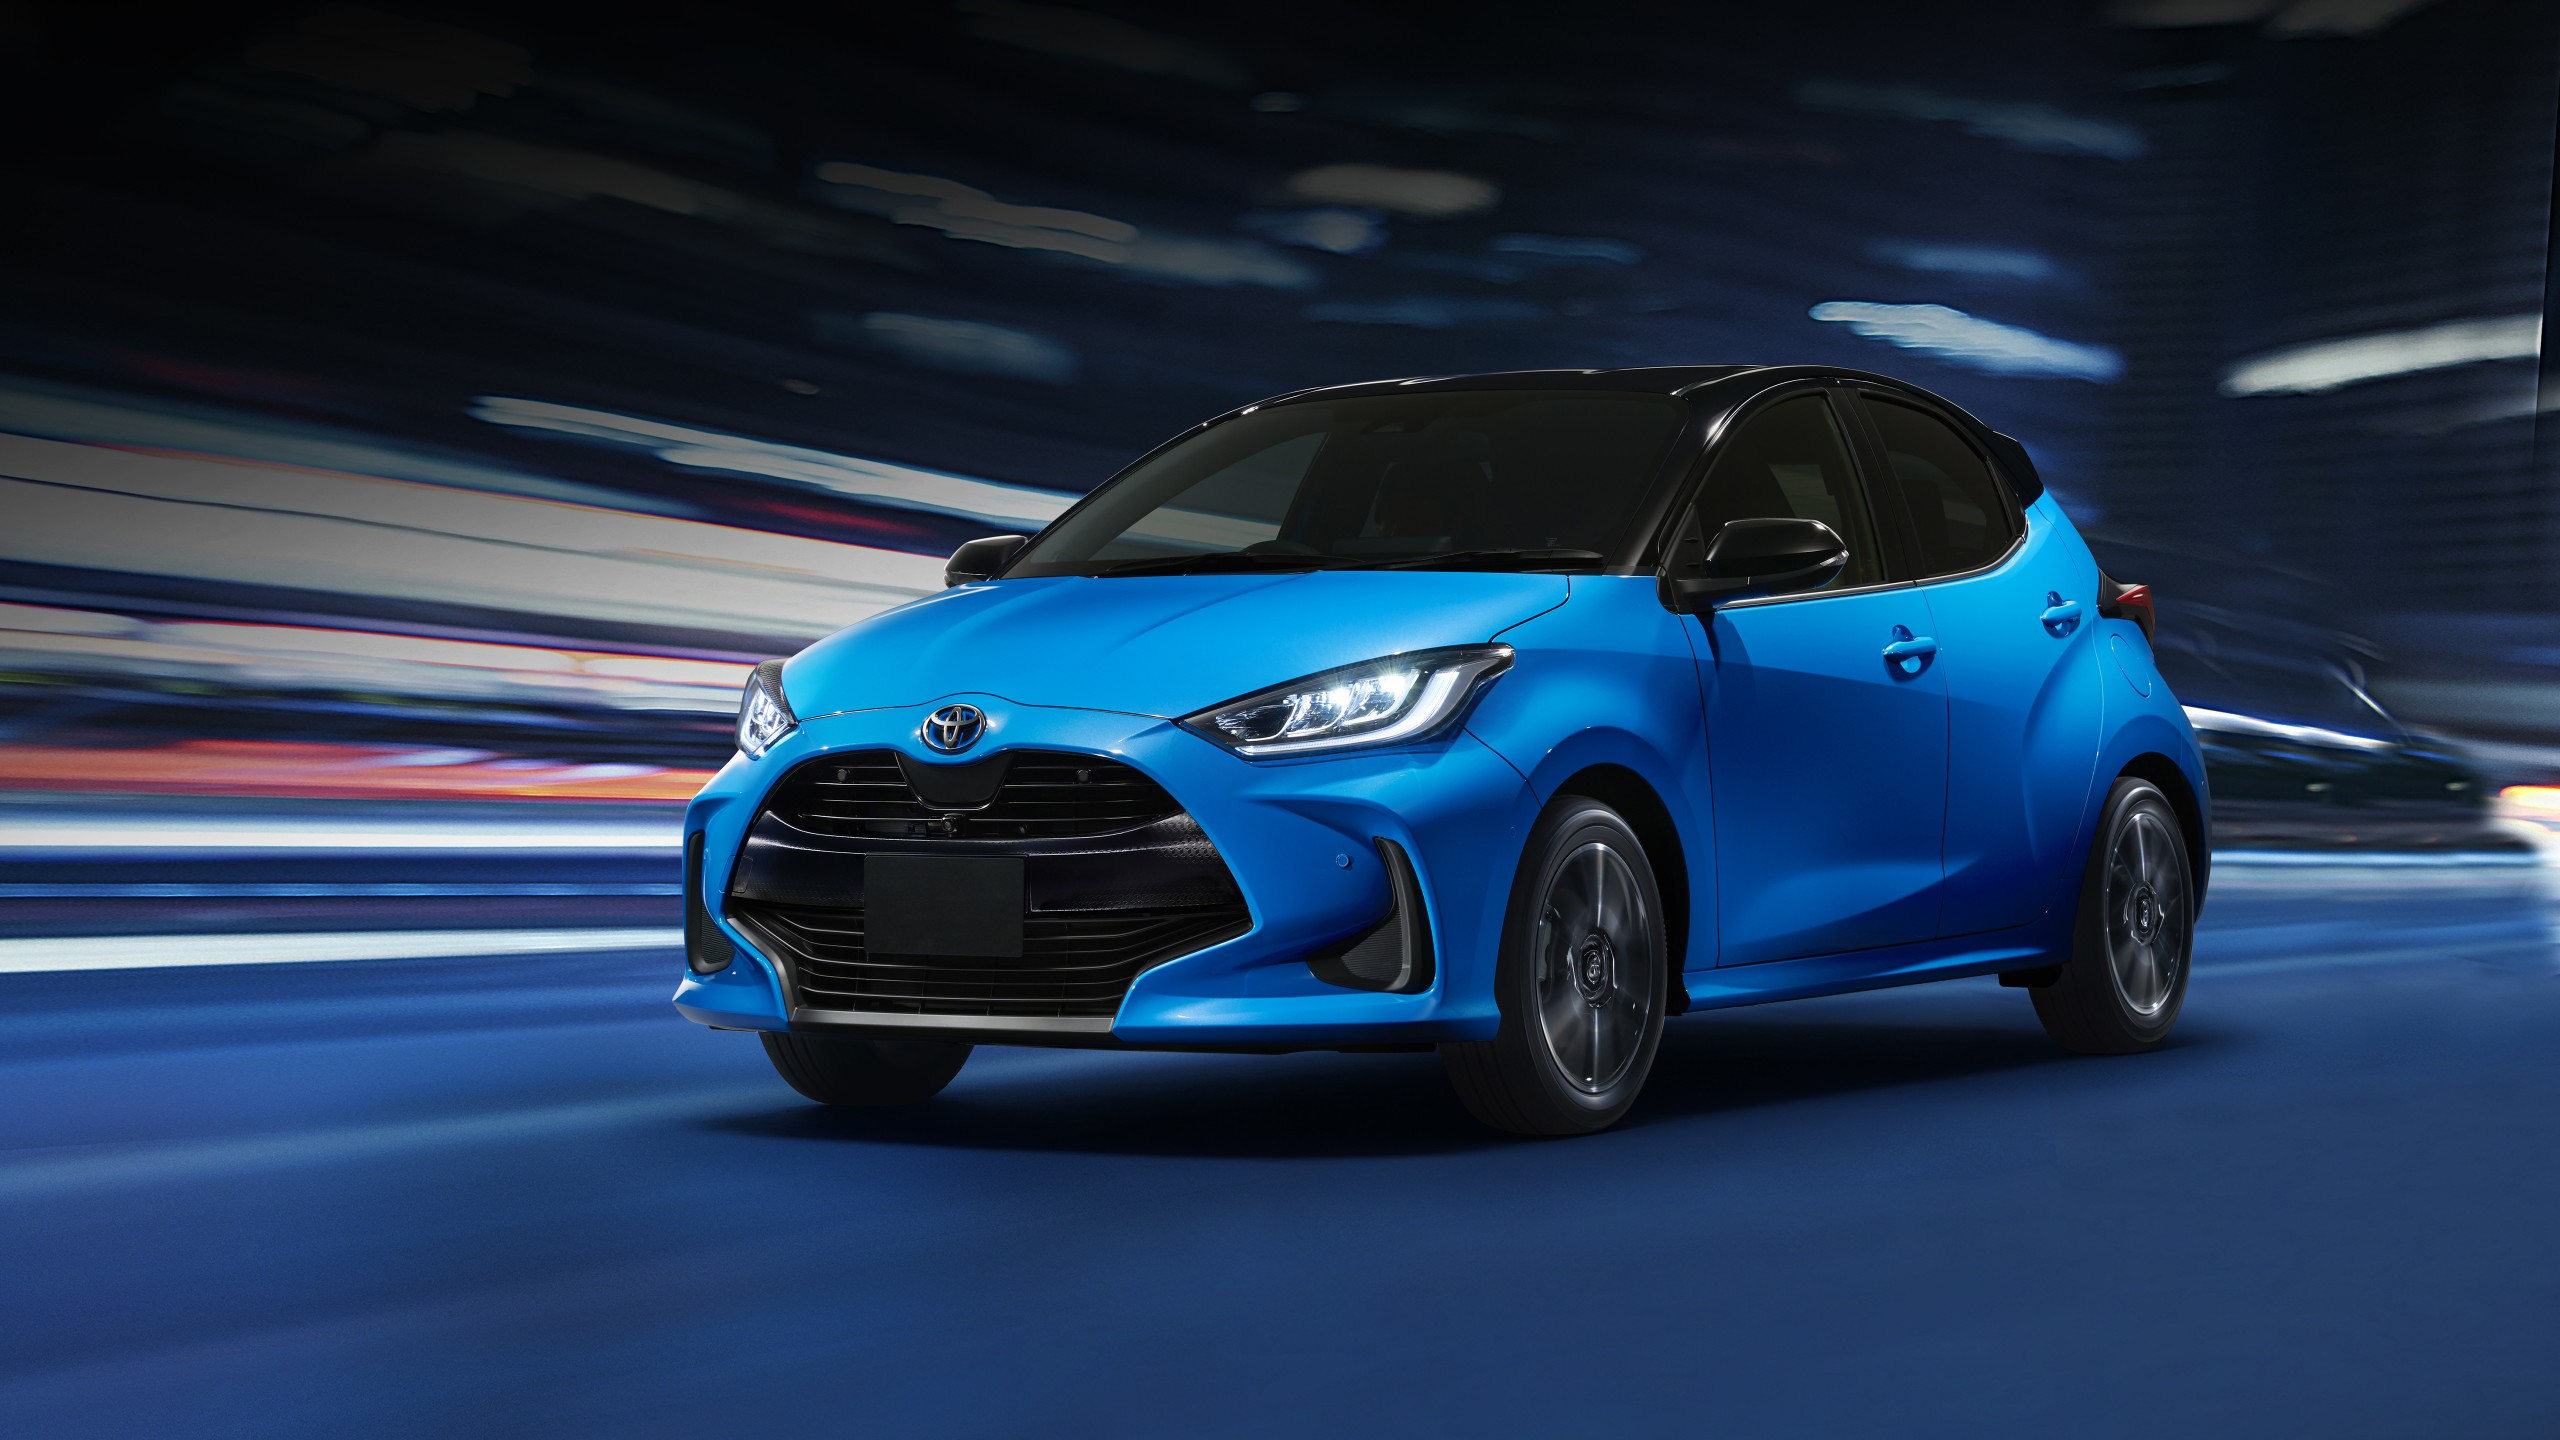 toyota yaris hybrid 2020 4k wallpaper | hd car wallpapers